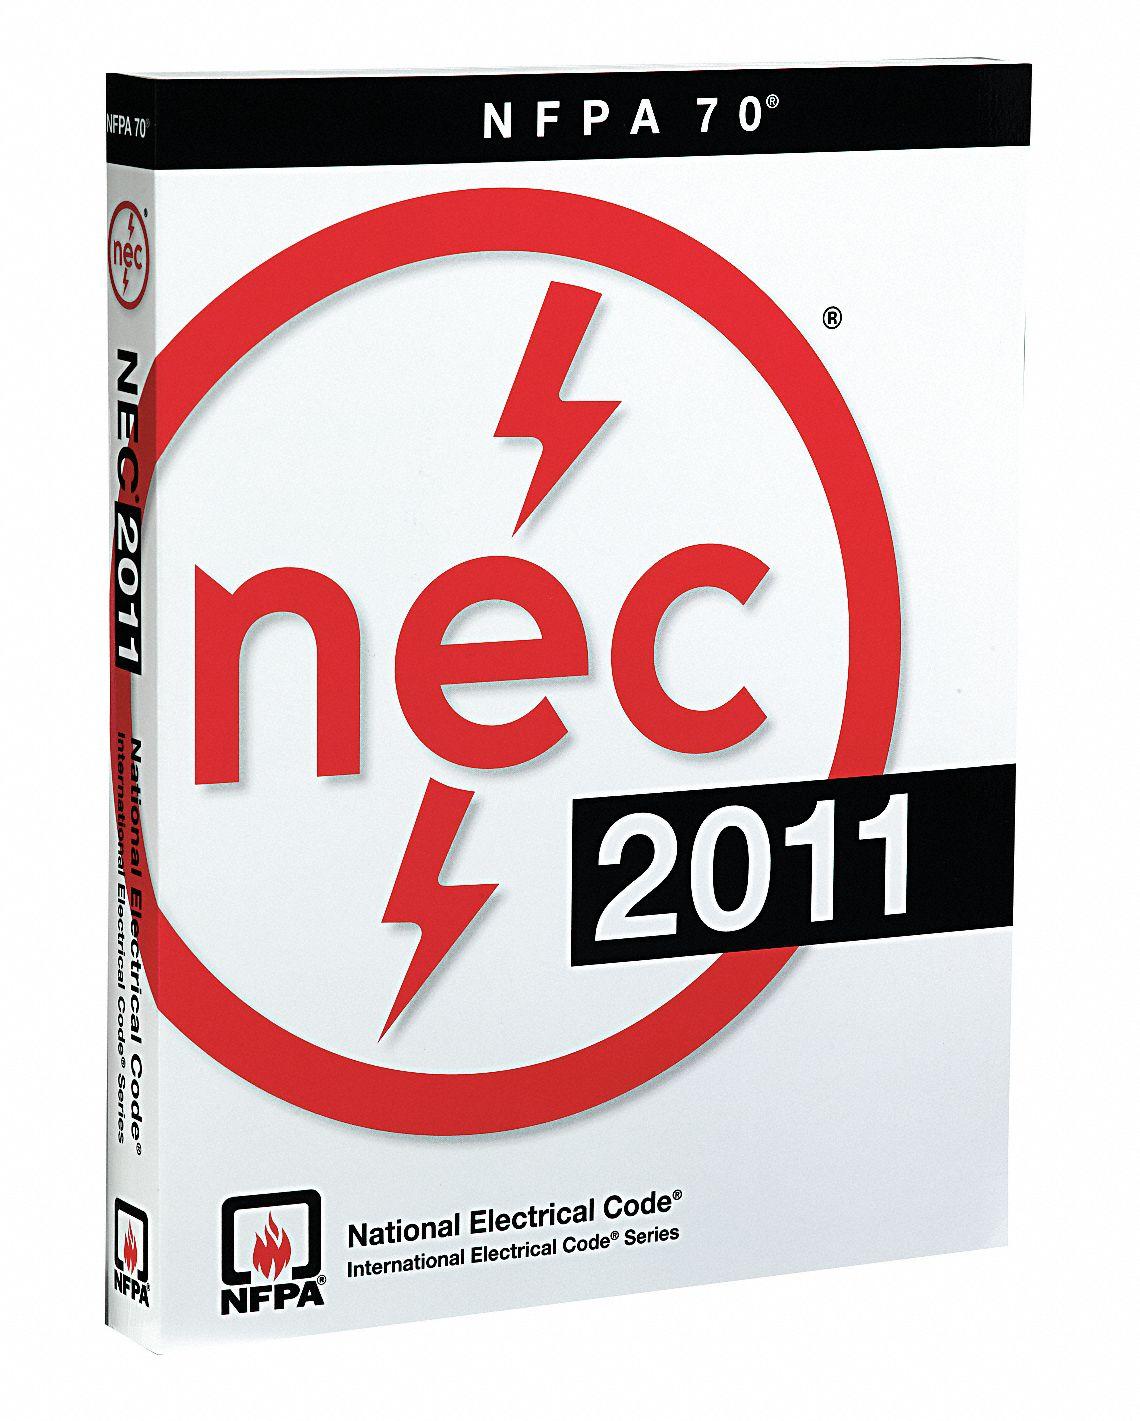 Unique Residential Electric Code Sketch - Electrical Diagram Ideas ...